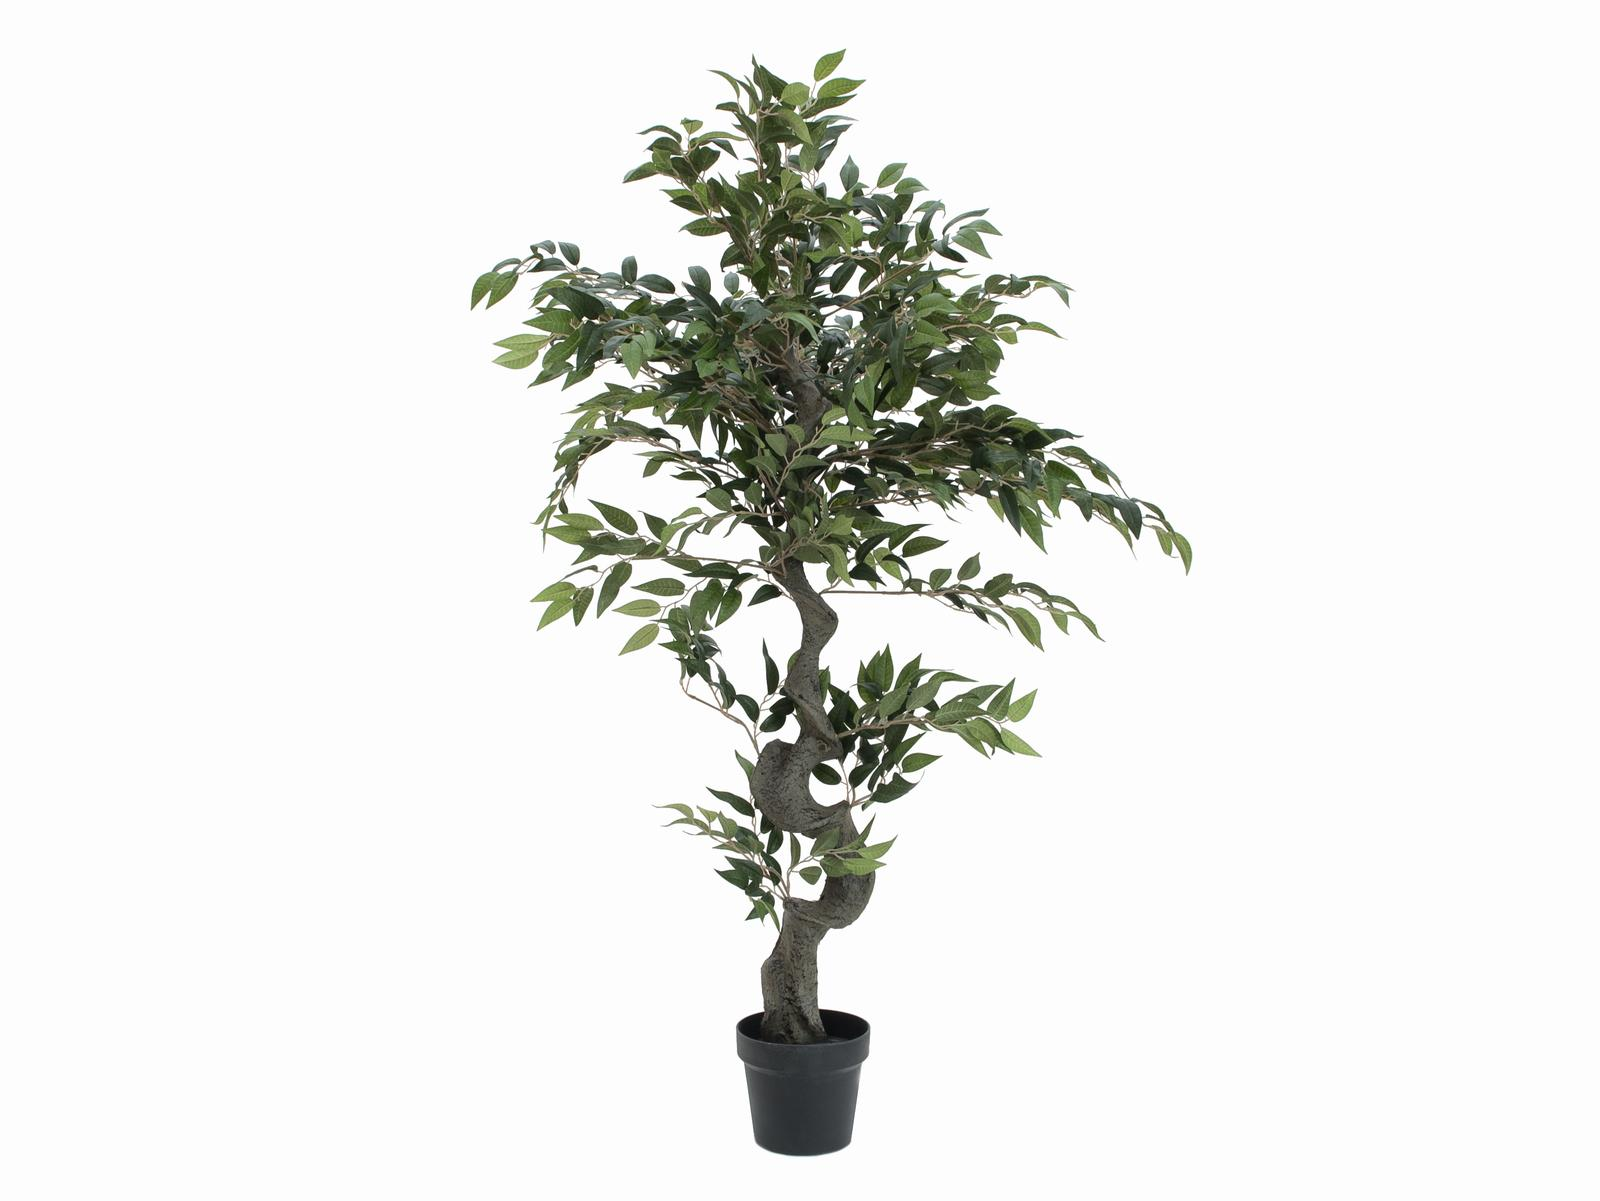 europalms-ficus-waldbaum-110cm-kunststoff